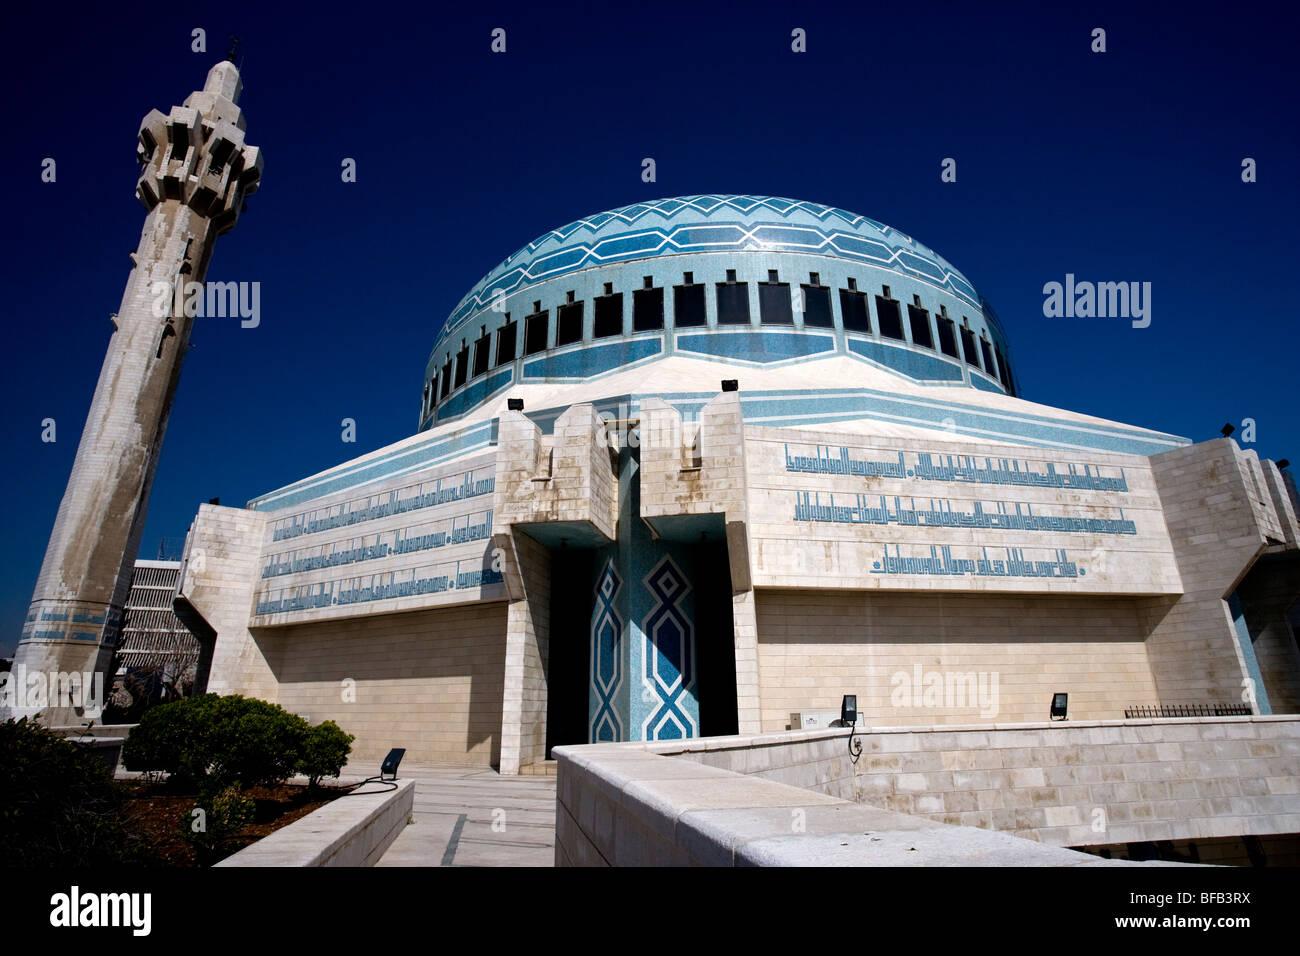 King Abdullah Mosque, El-Abdali district, Amman, Jordan - Stock Image